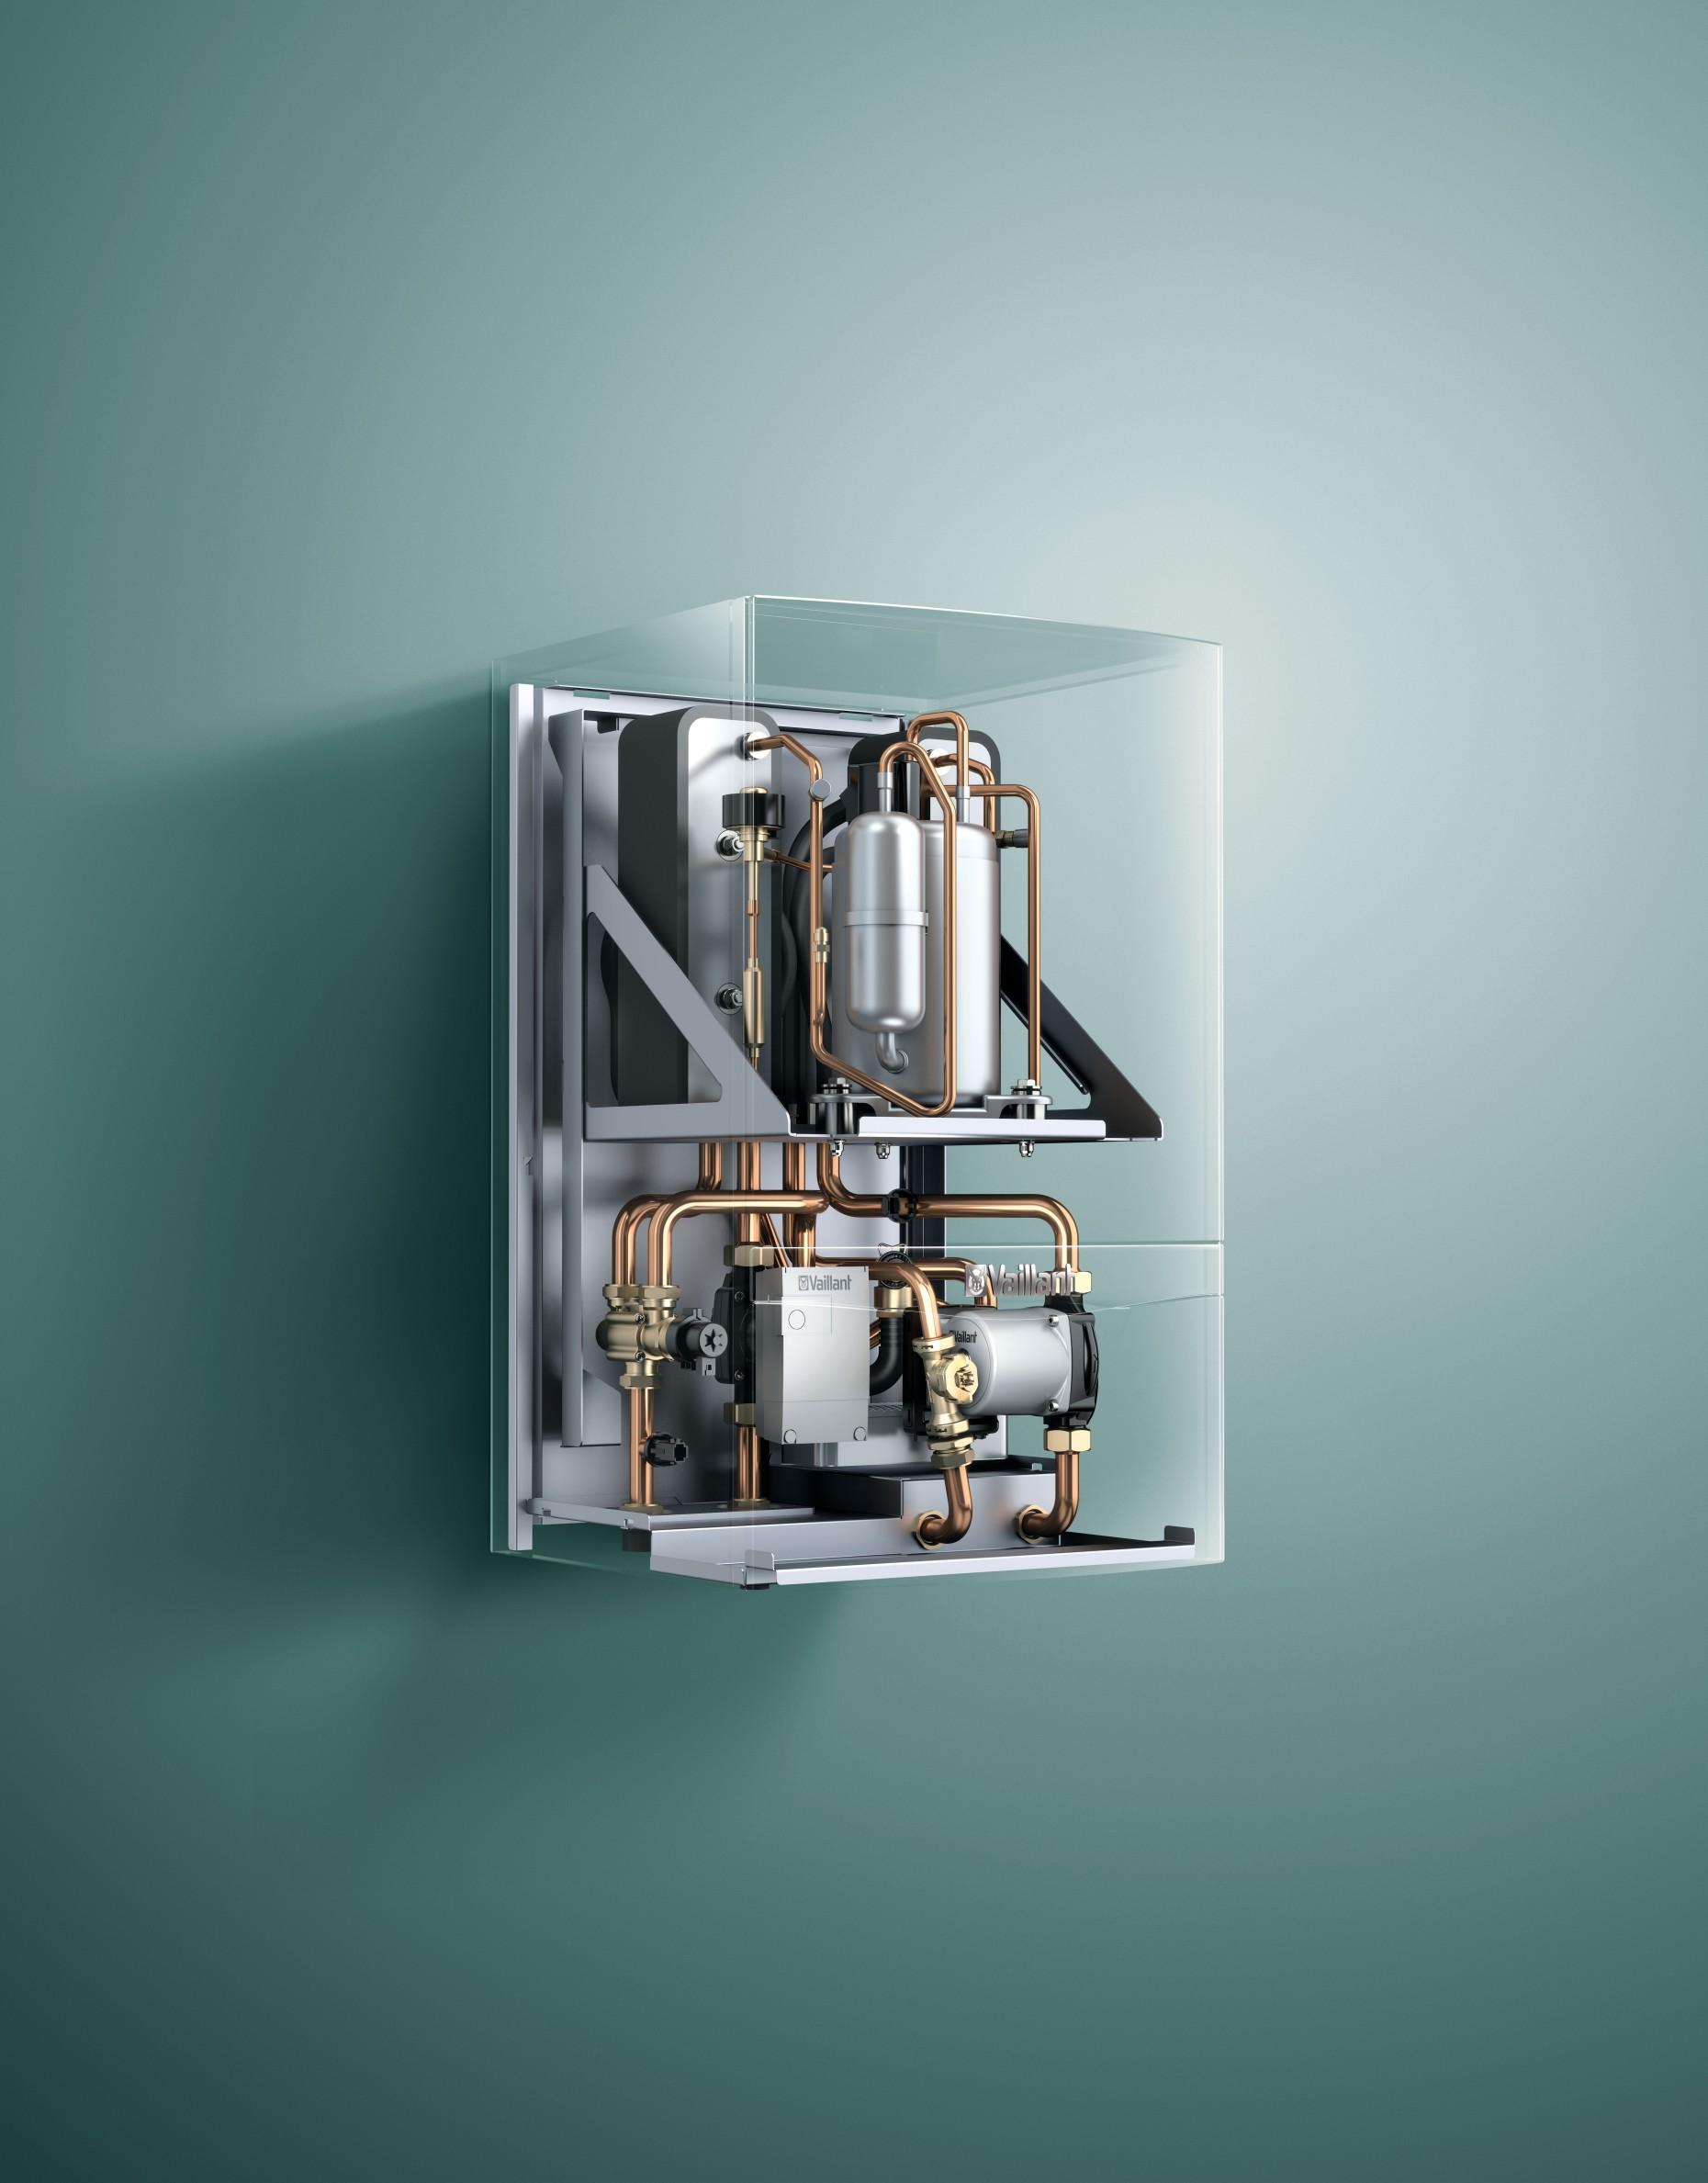 pompe chaleur sol eau murale hybride geotherm hybride. Black Bedroom Furniture Sets. Home Design Ideas